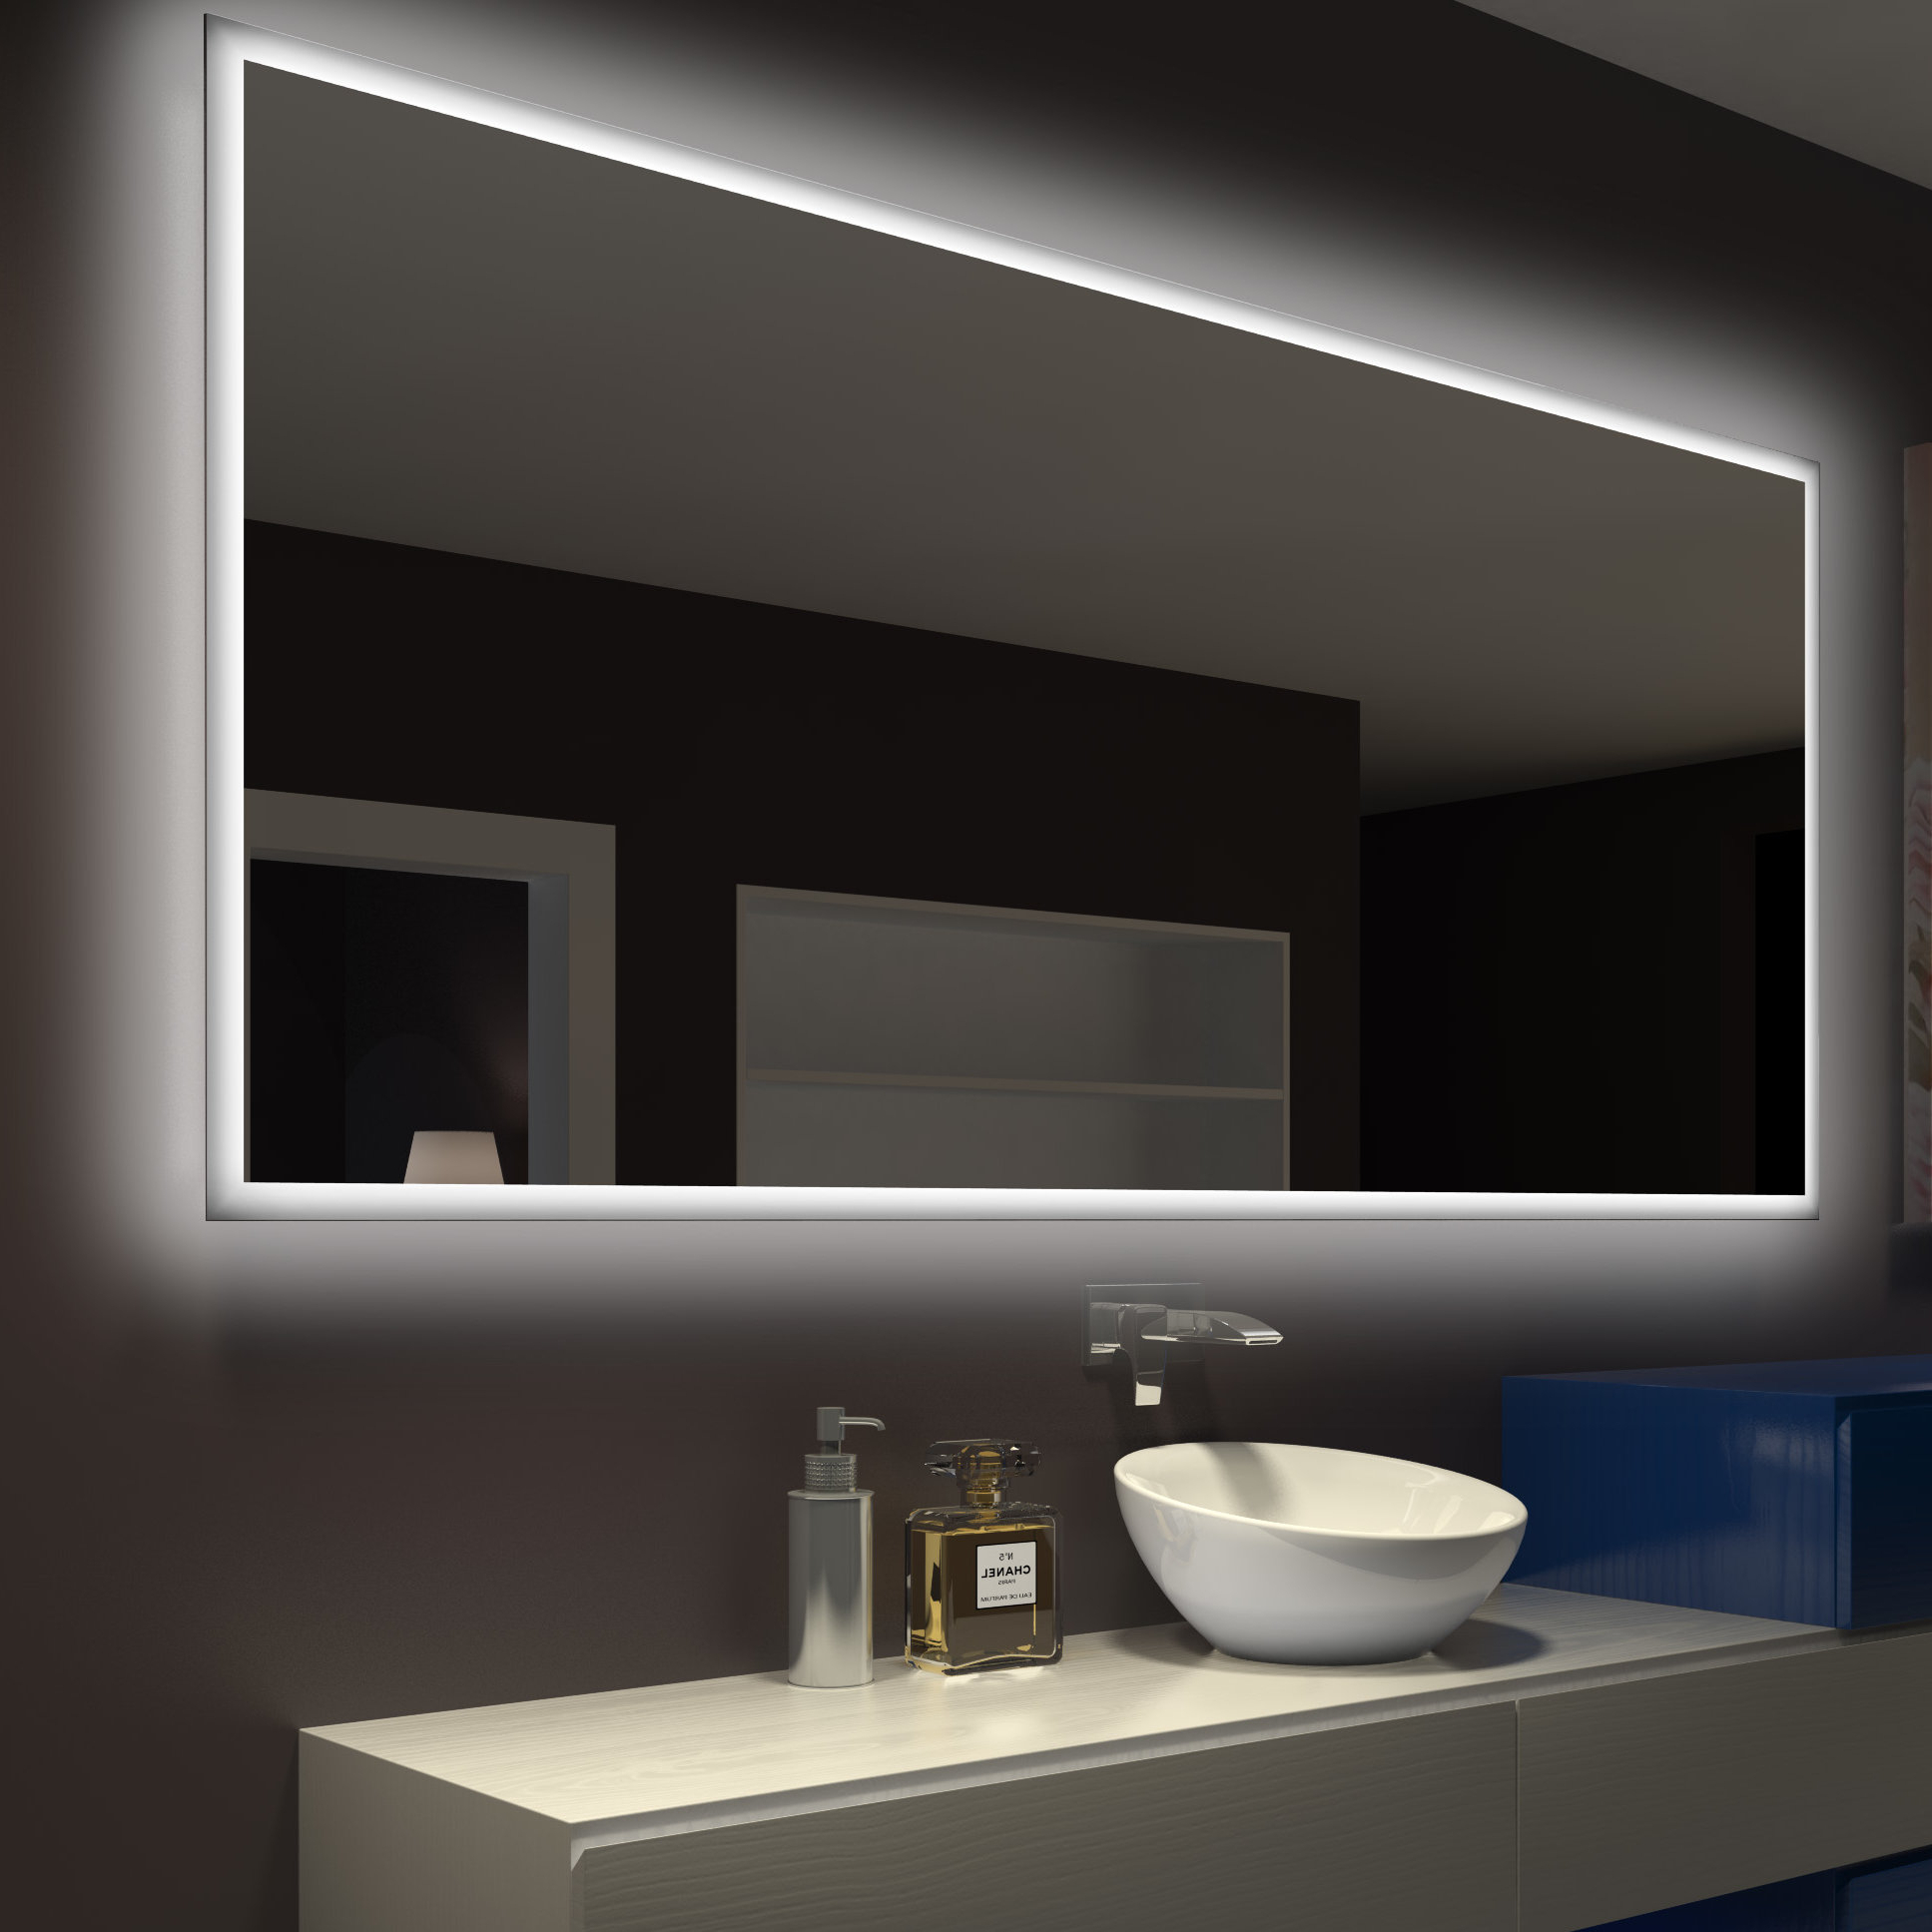 2020 Vanity Wall Mirrors For Bathroom Regarding Rectangle Backlit Bathroom/vanity Wall Mirror (View 3 of 20)